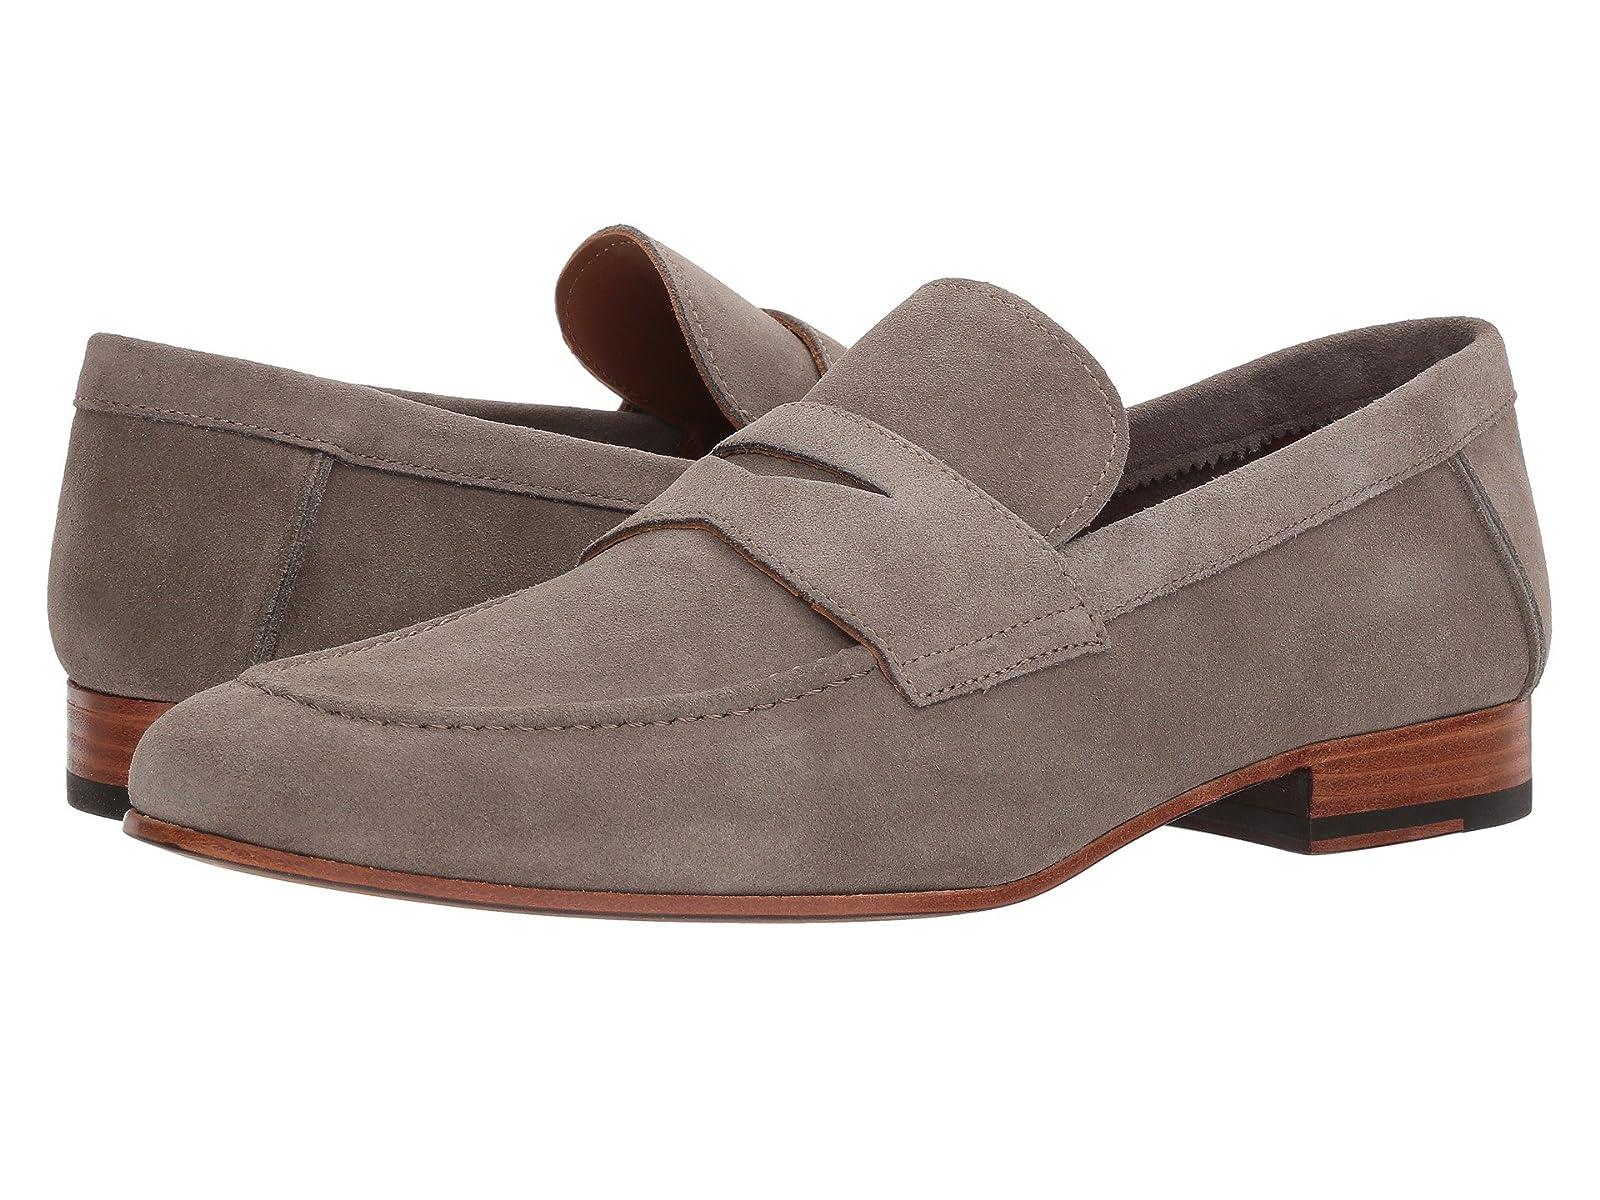 Gordon Rush WilfredAtmospheric grades have affordable shoes